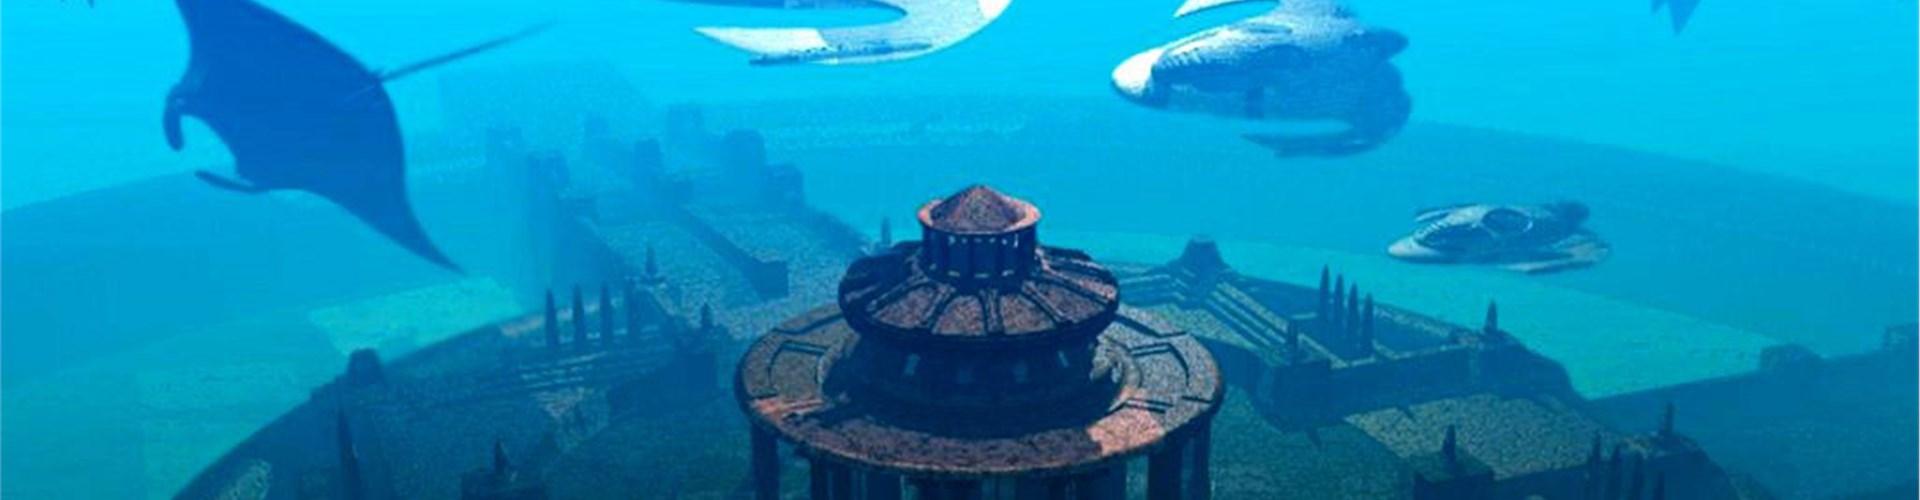 Santorini the legend of Atlantis